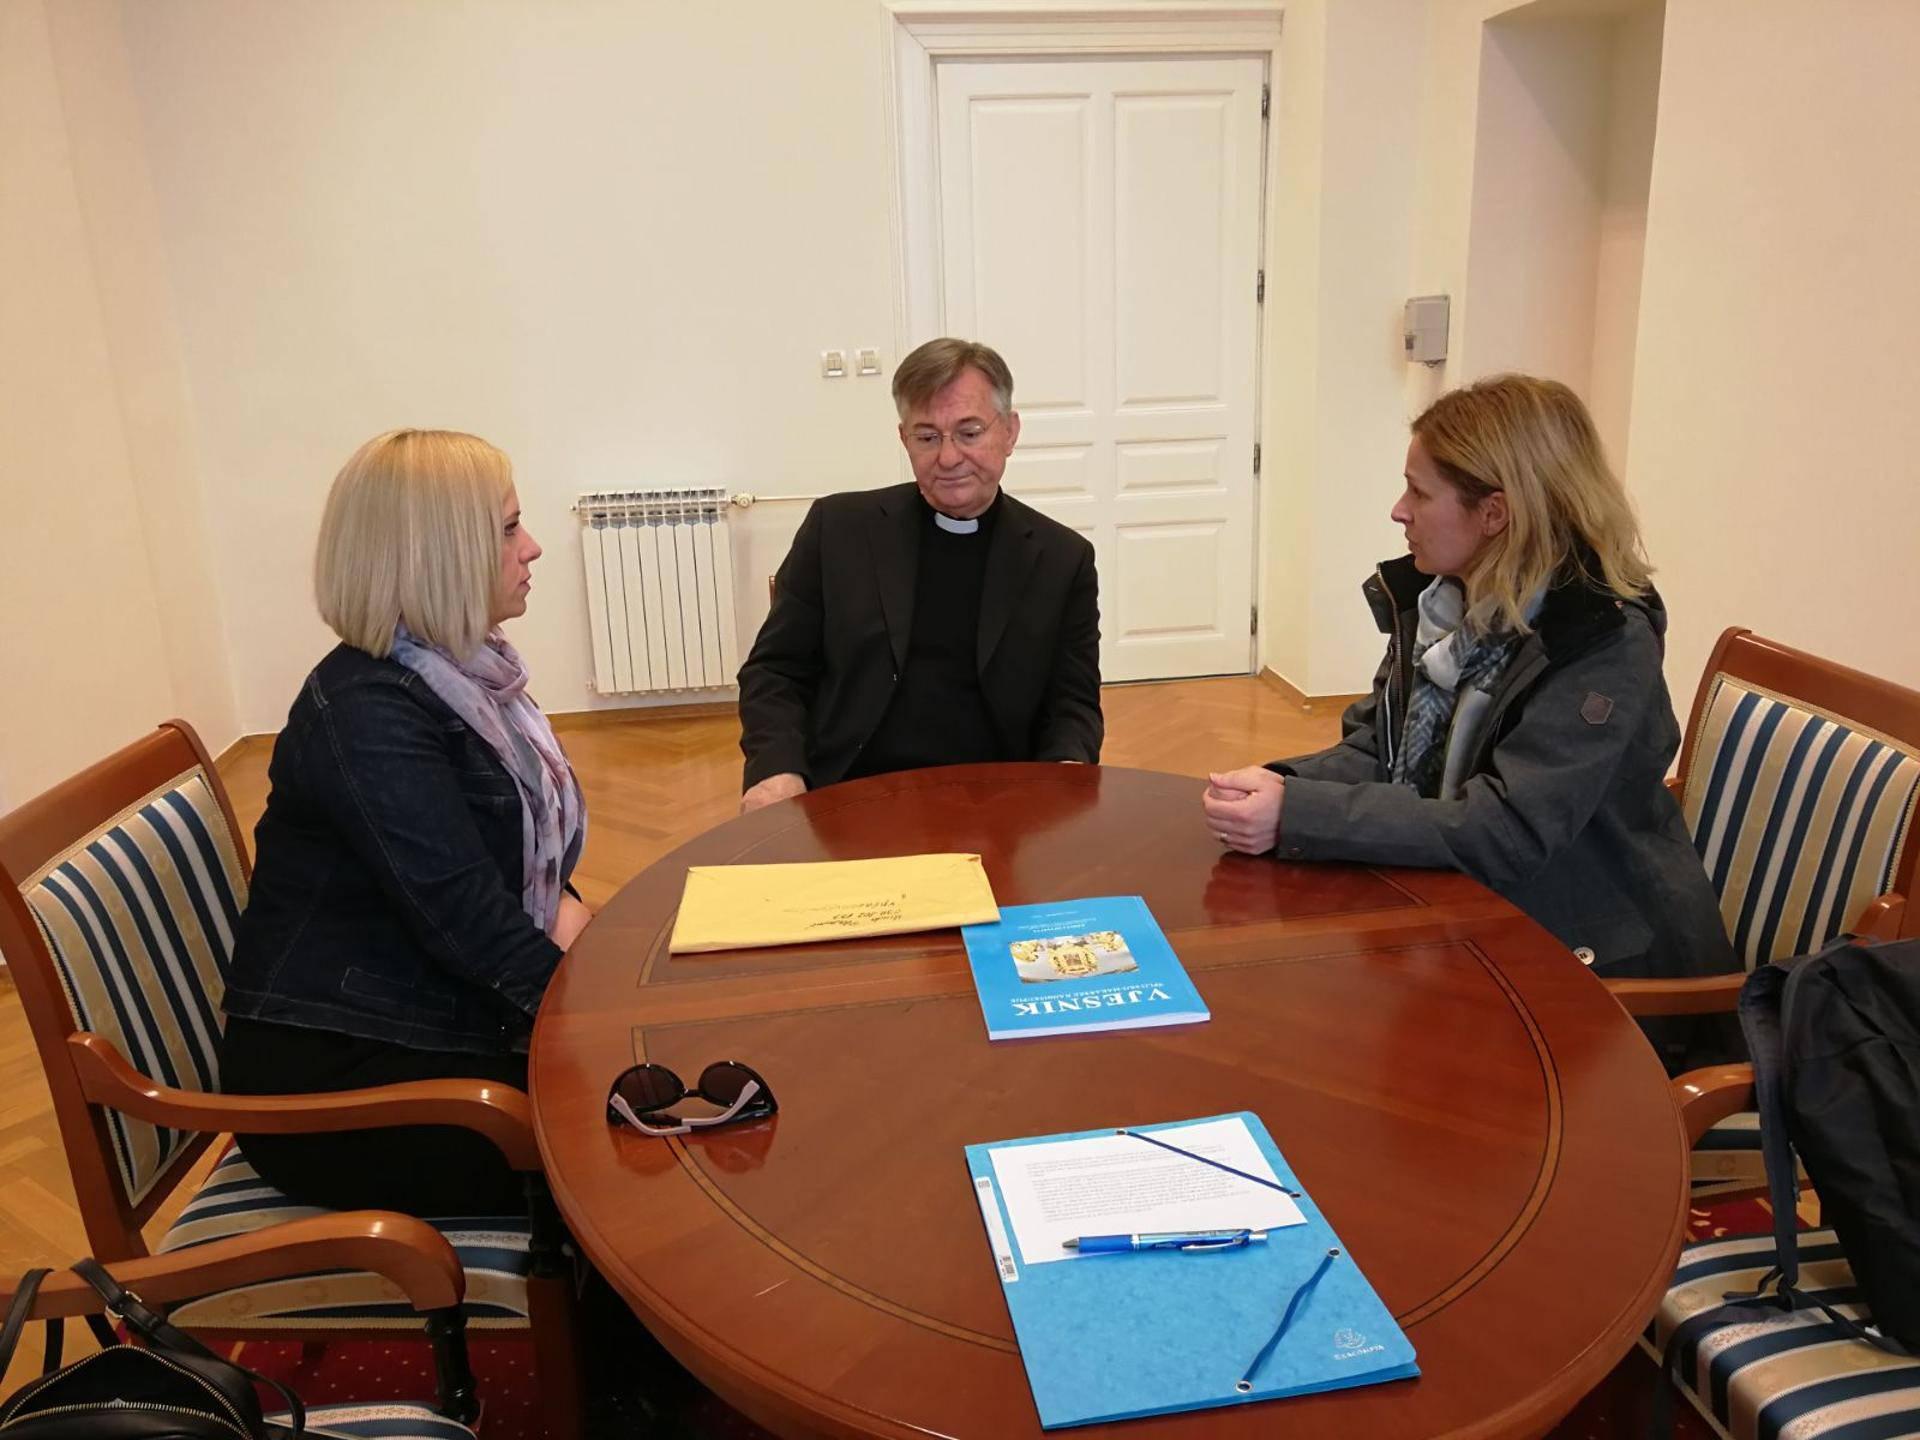 Nadbiskup primio Ninu Kuluz: 'Odluke suda legitimne, ali...'